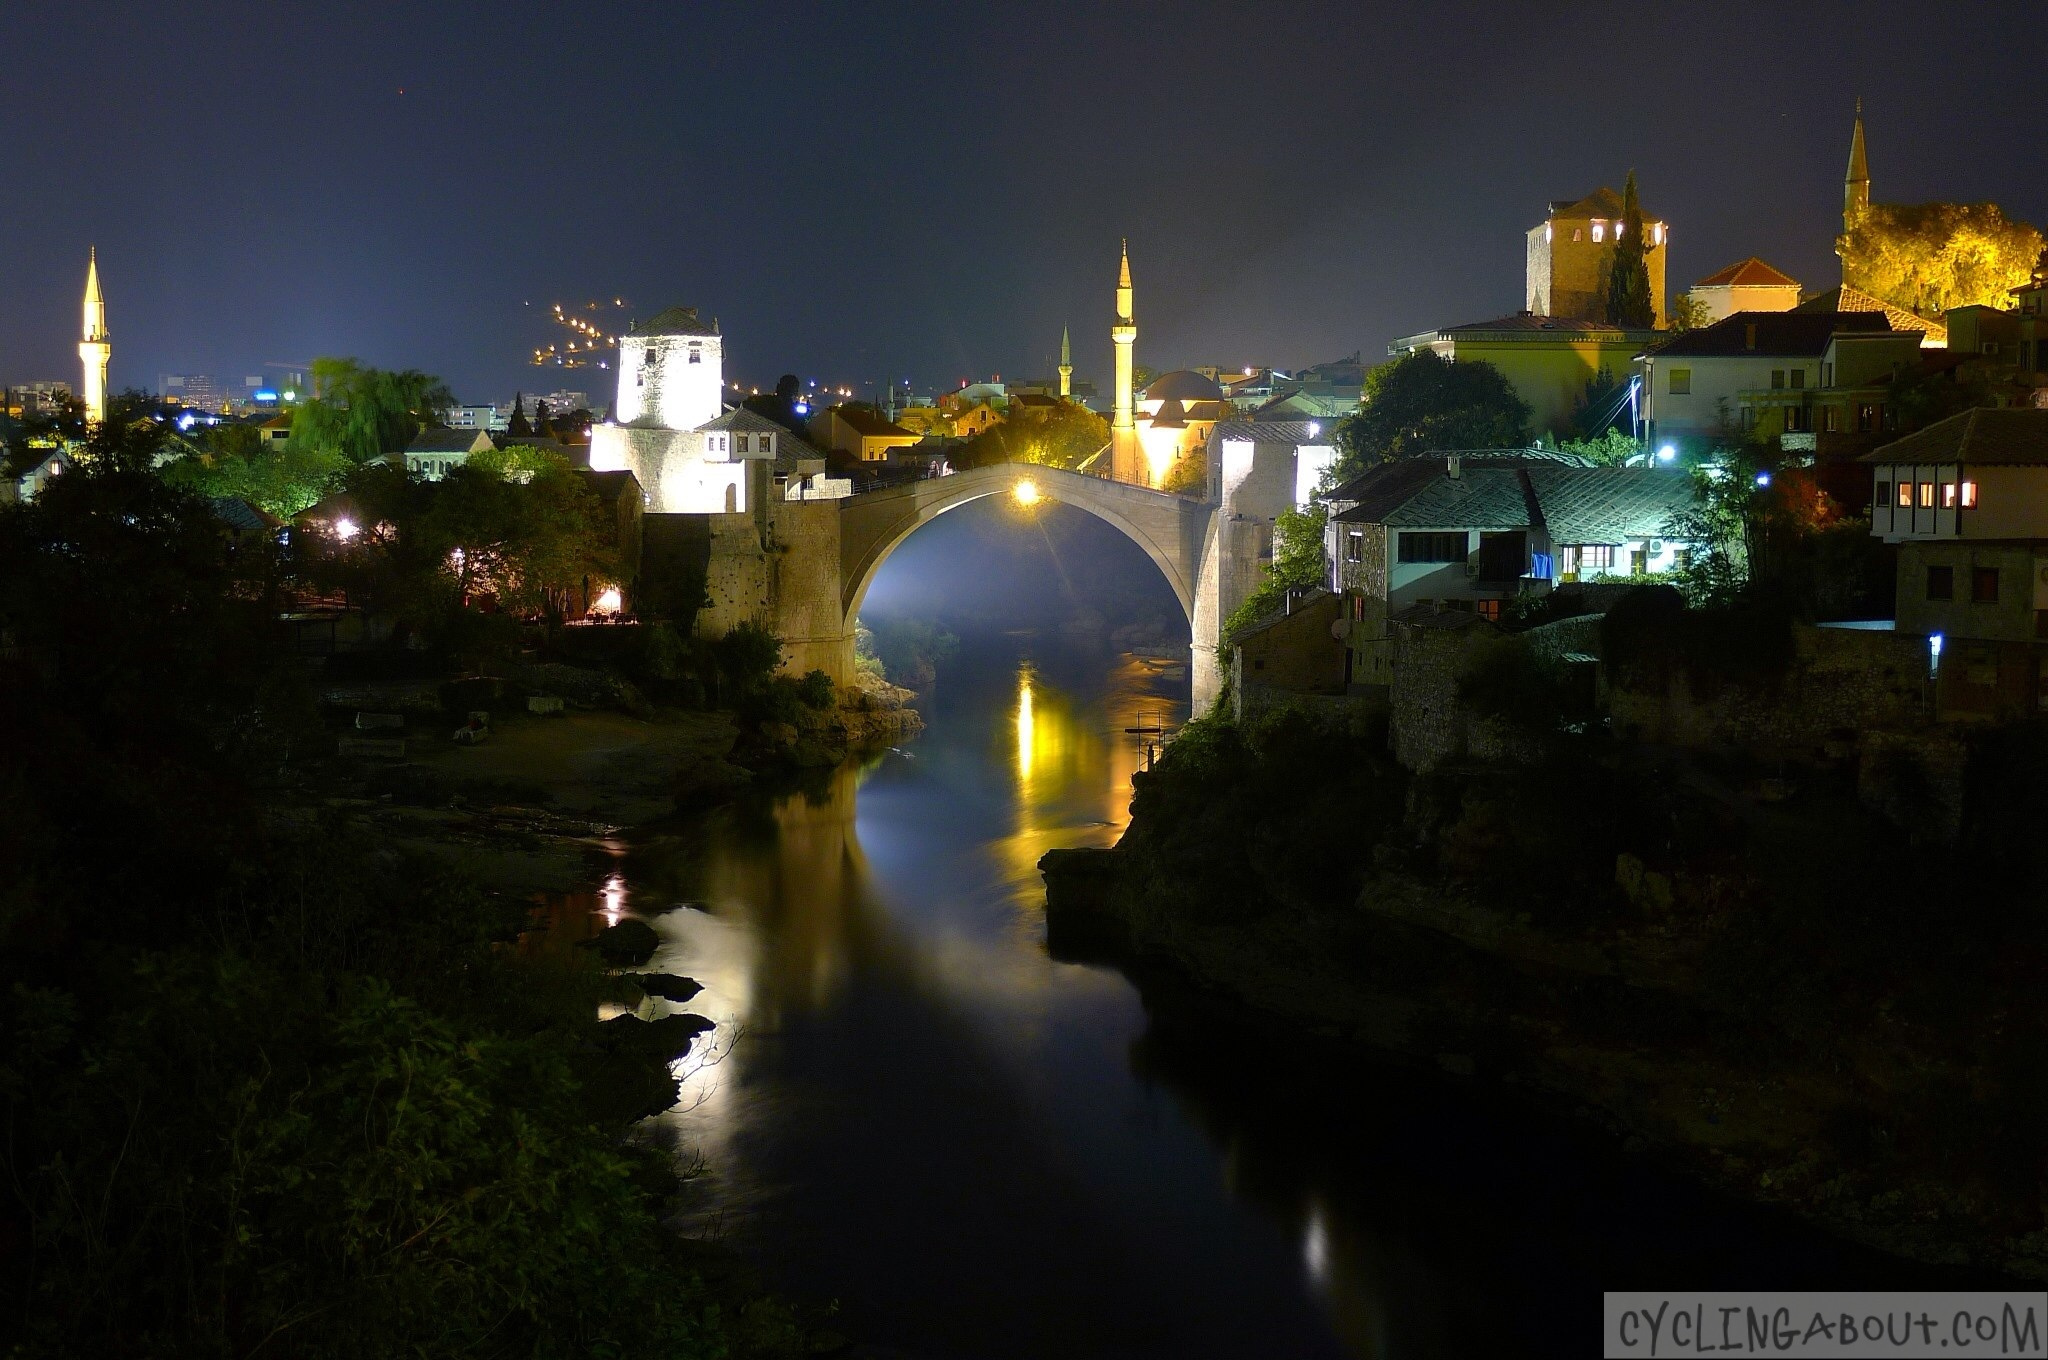 Alleykat_Bosnian night